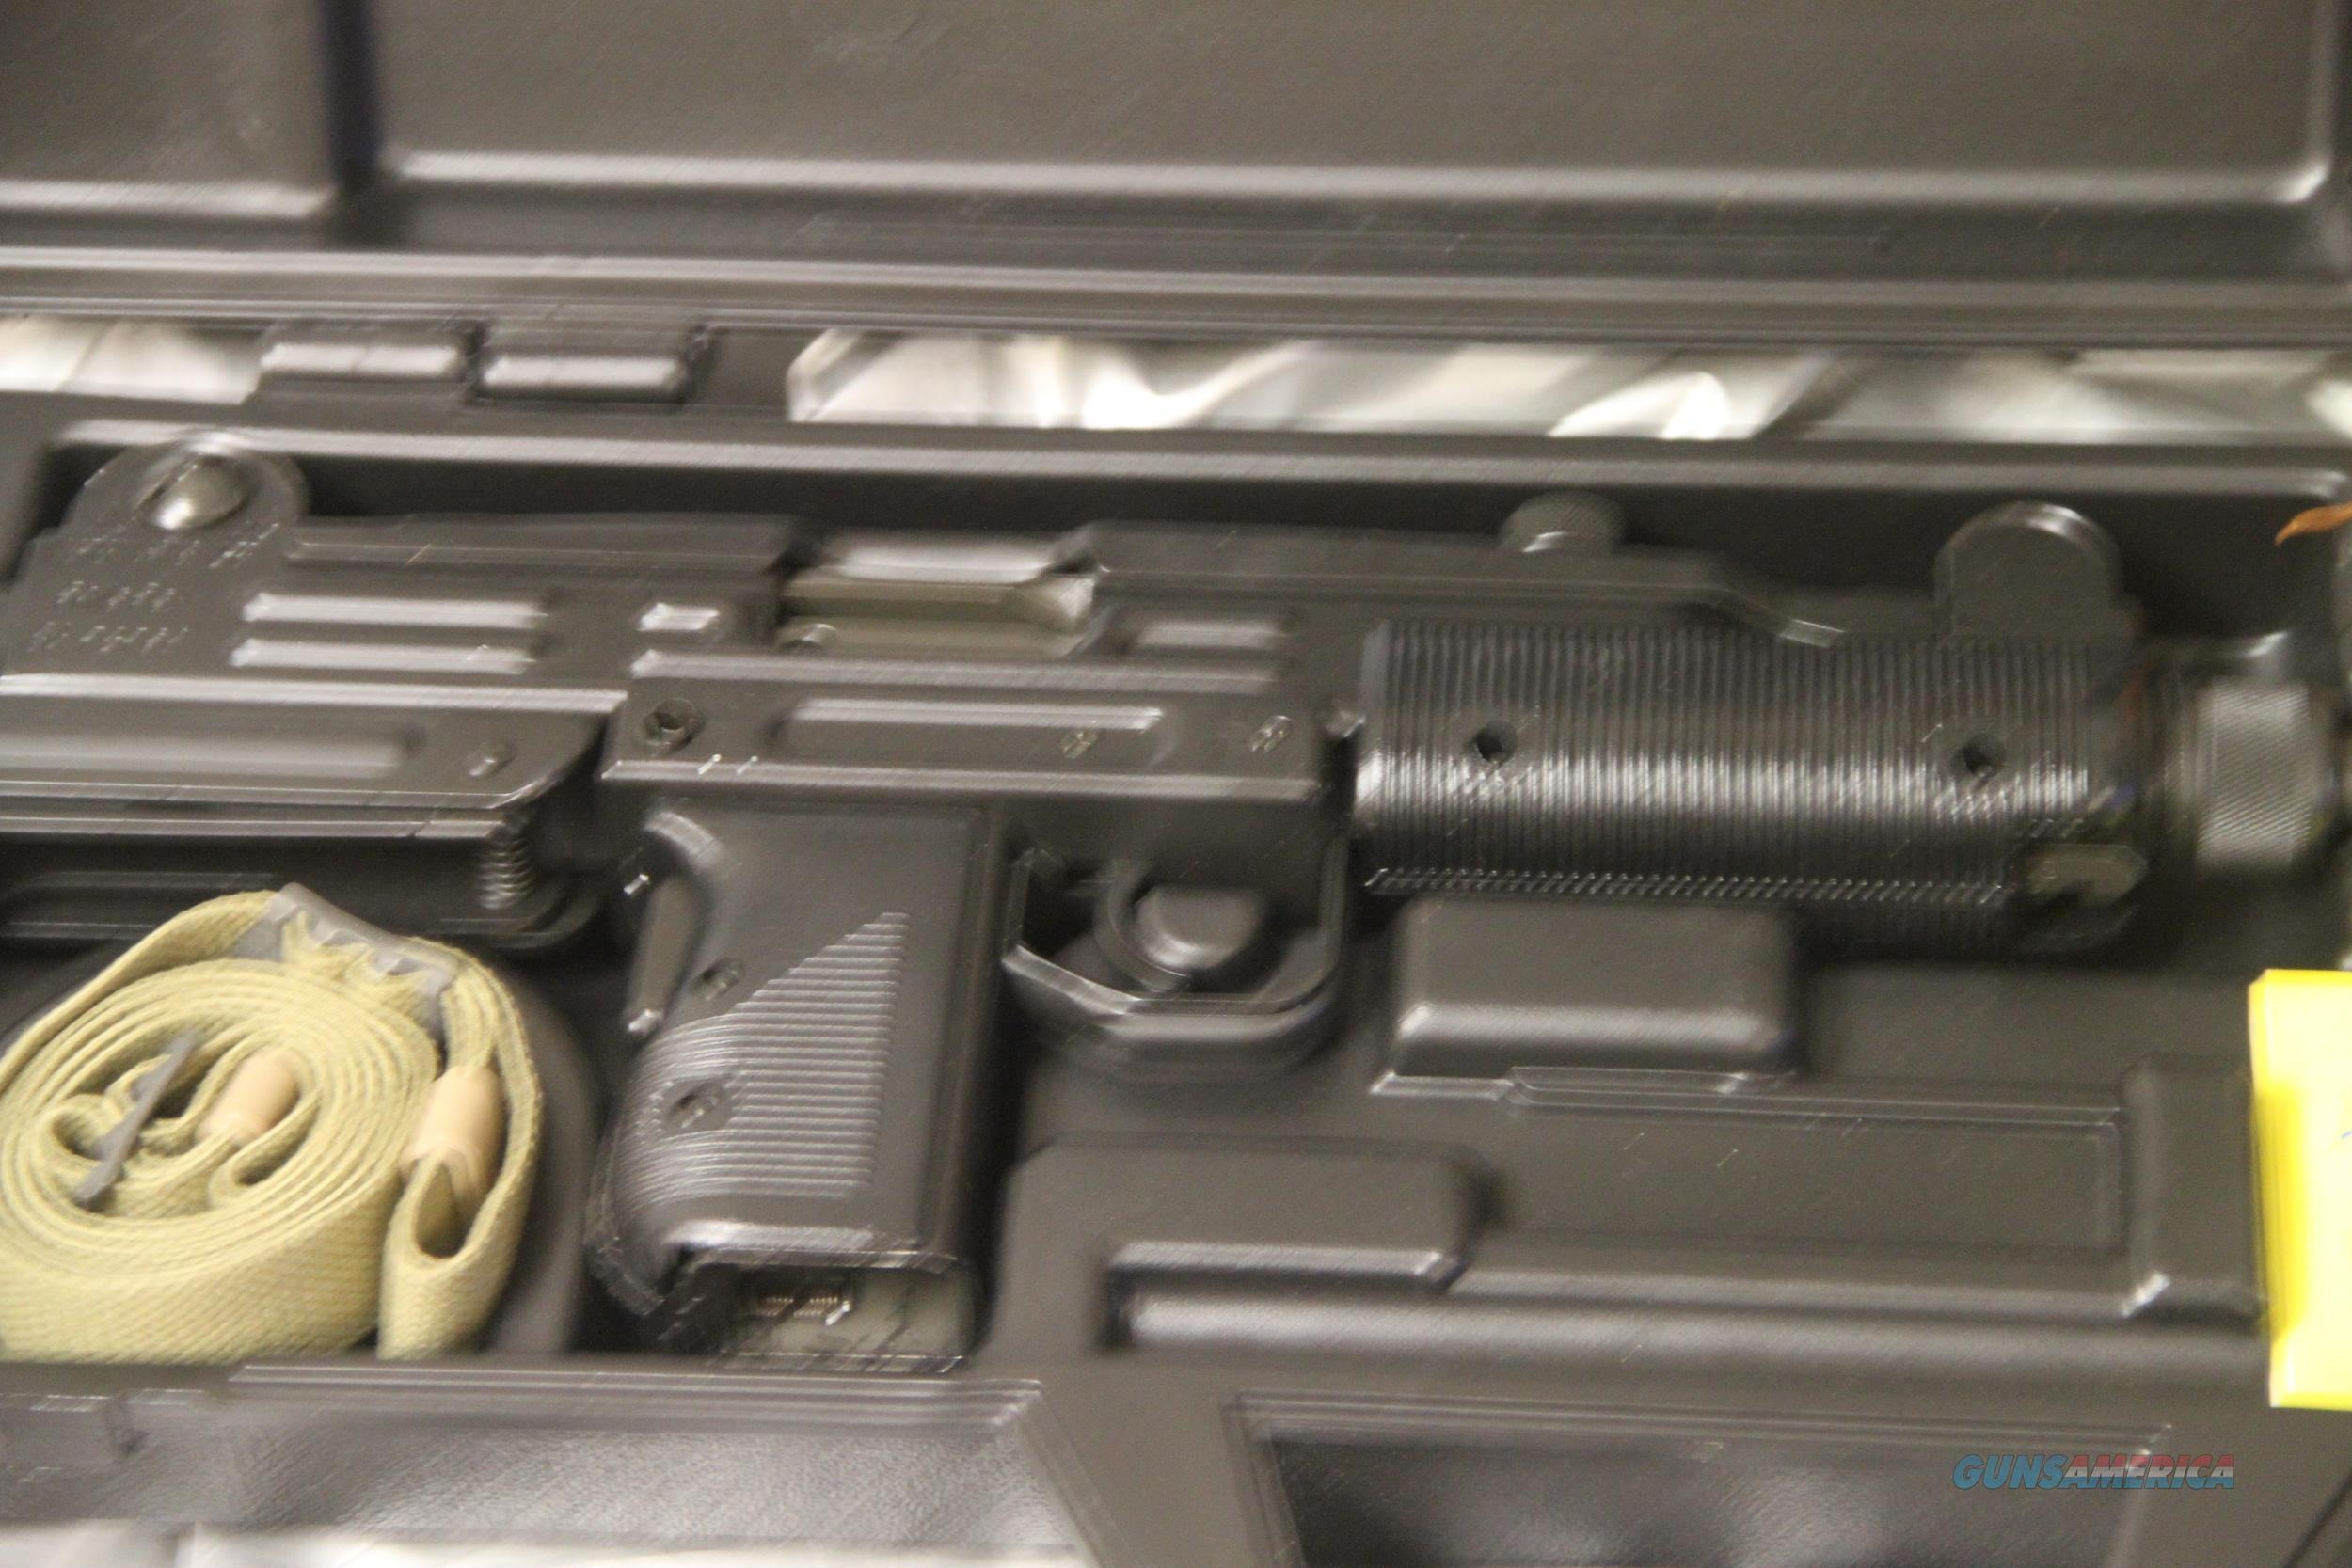 For sale trade imi uzi carbine made in israel 9mm - Action Arms Israeli Military Industries Imi Uzi Model B 9mm Nib Pre Ban